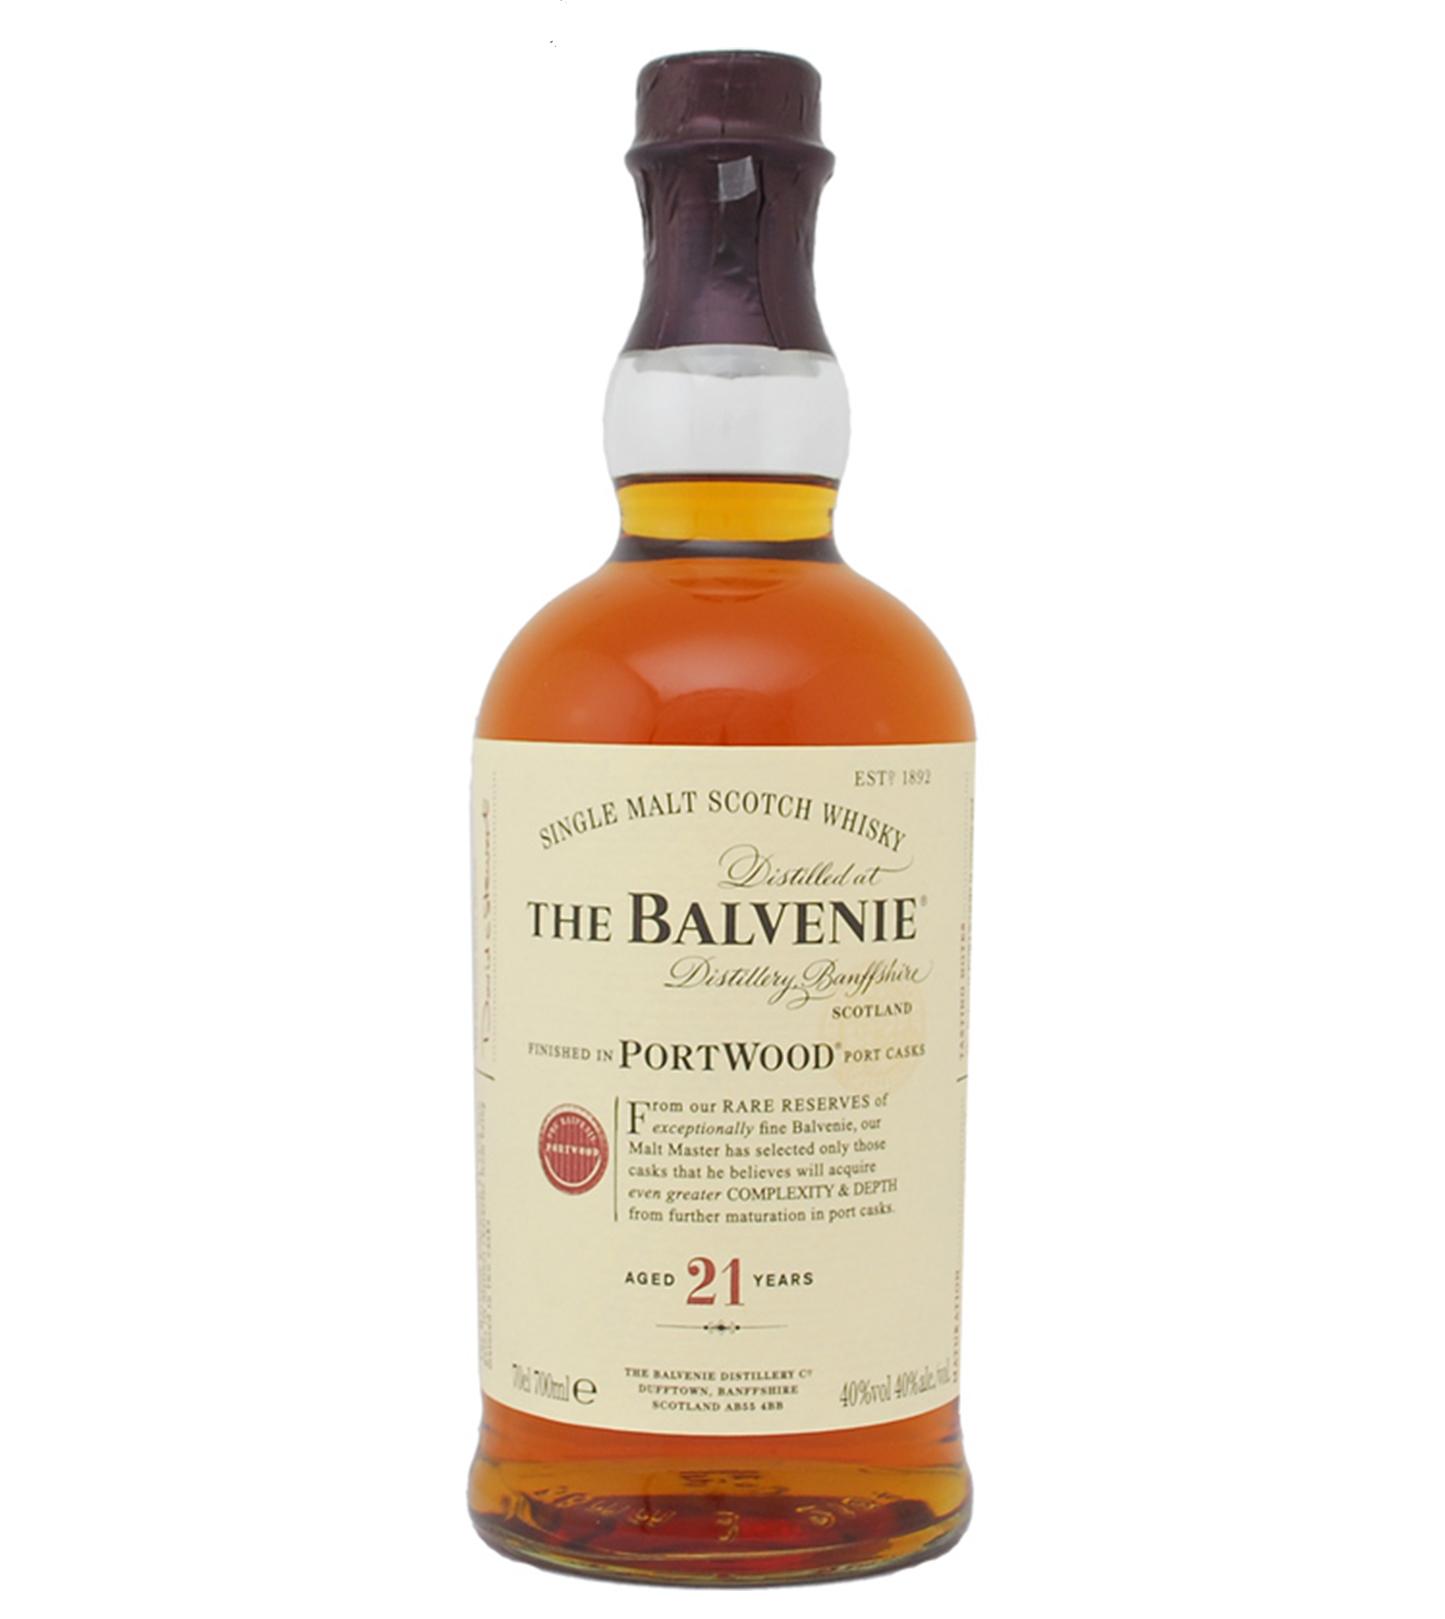 Balvenie 21 years – Portwood